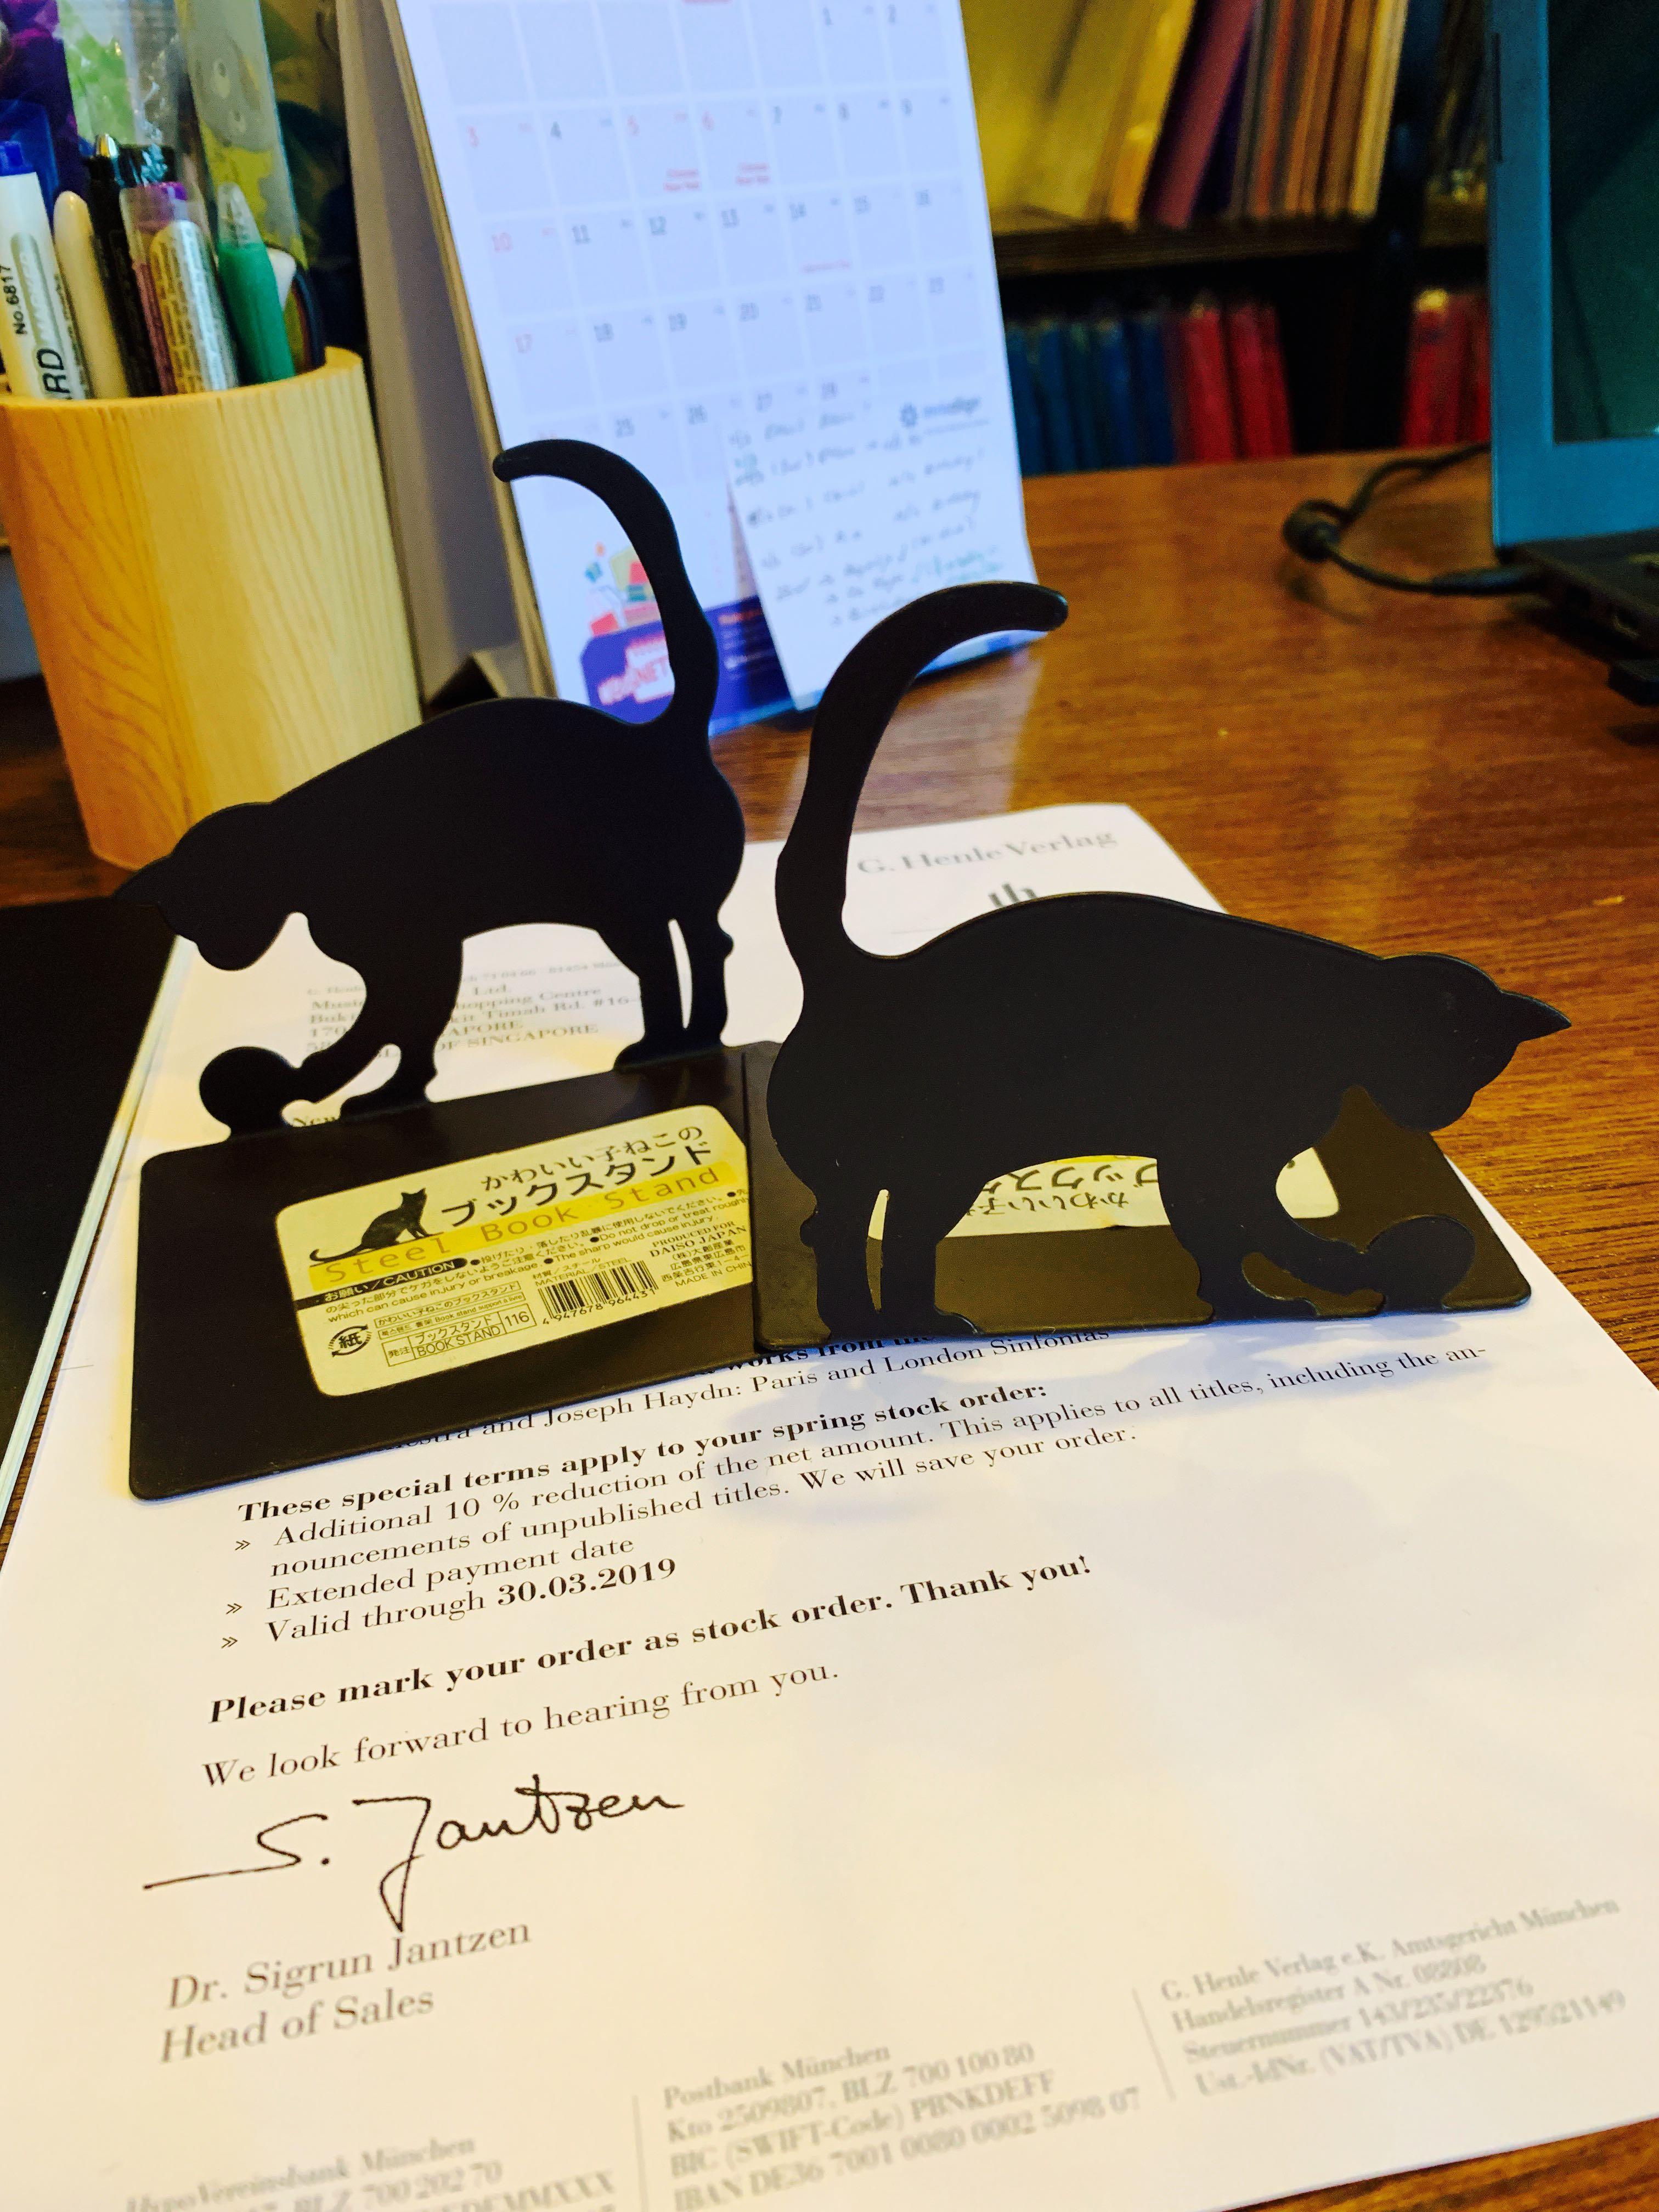 Steel Book Stand - Black Cat